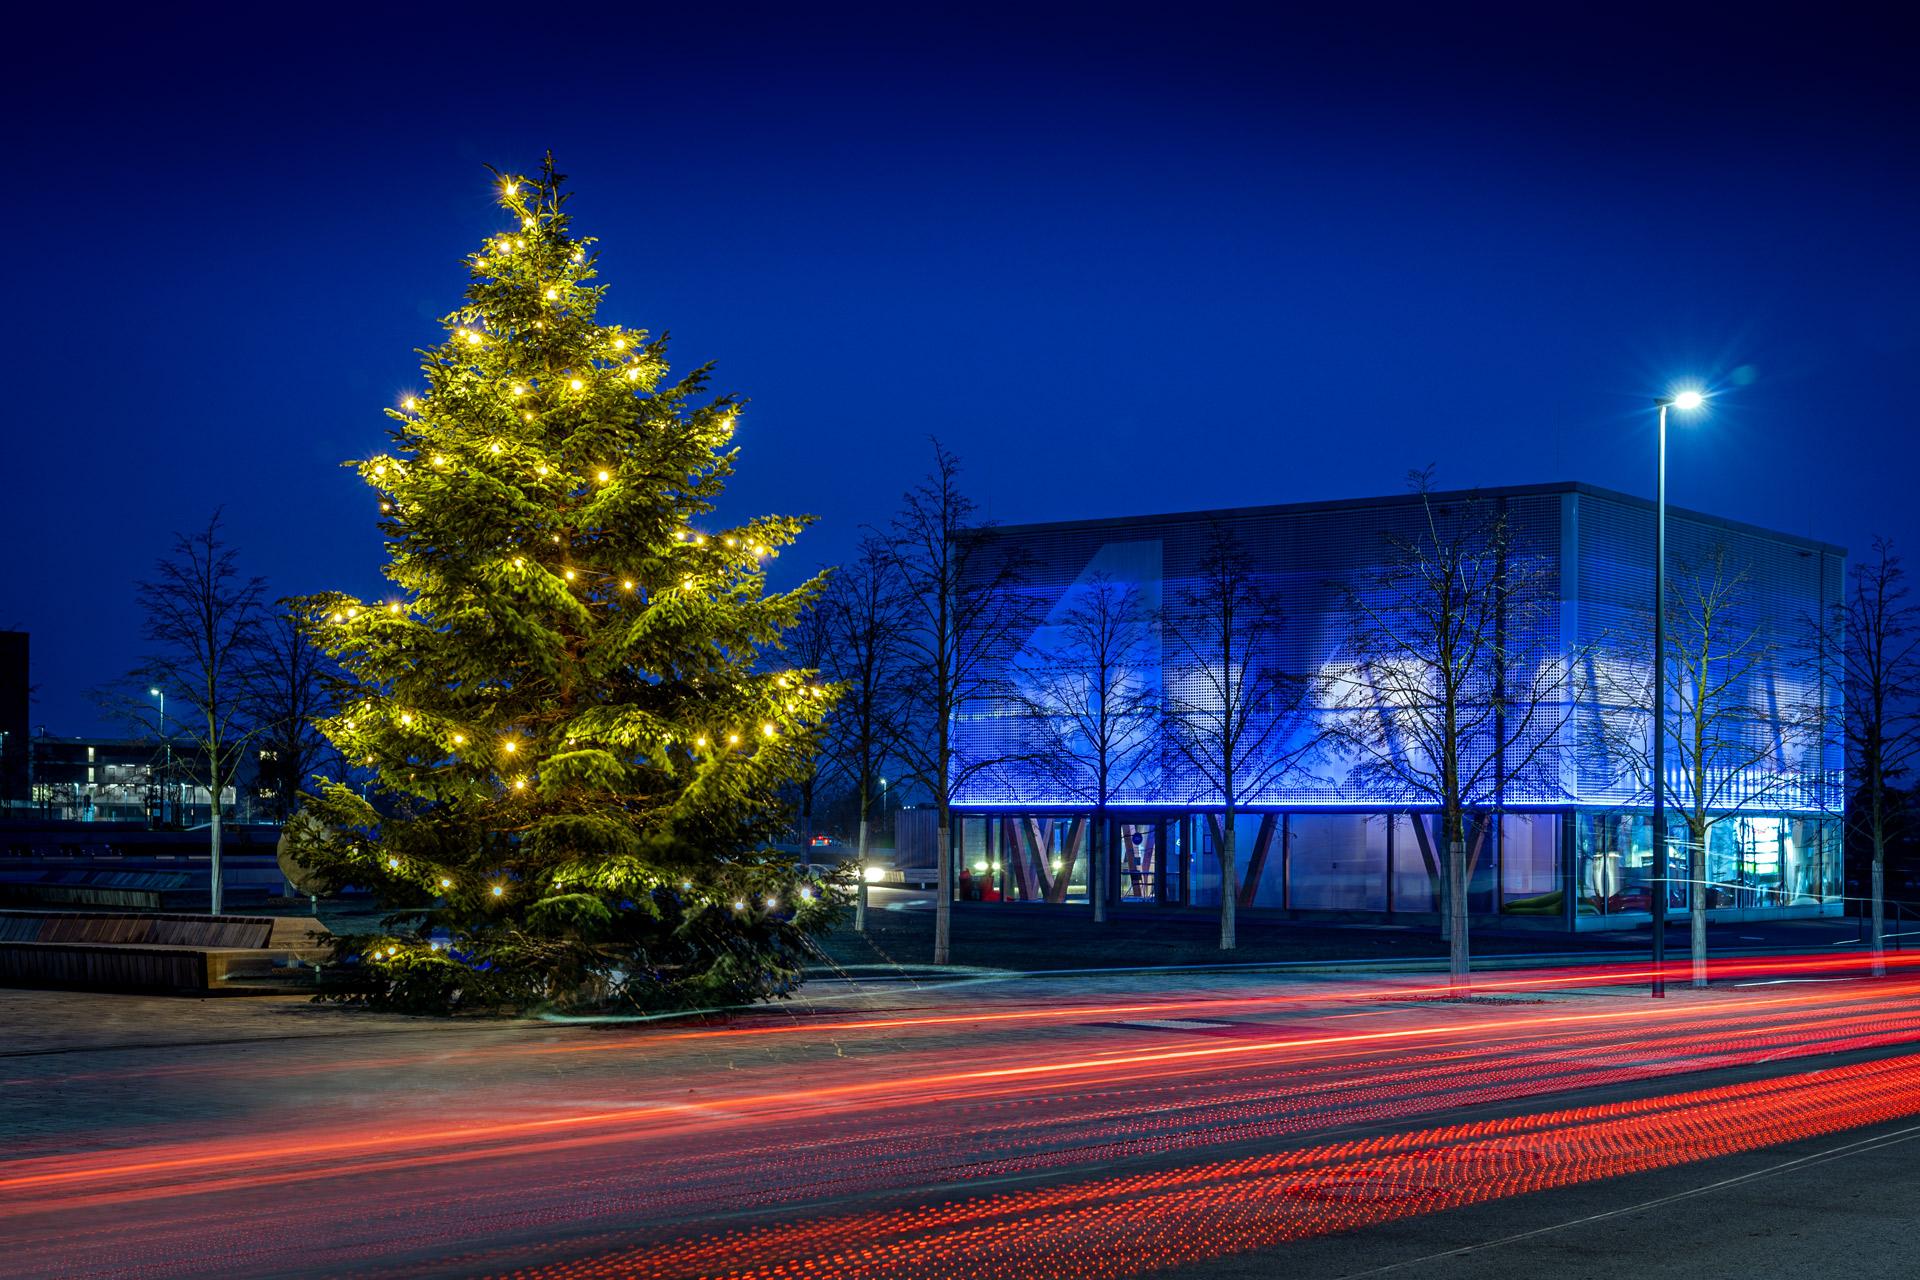 Frohe Weihnachten Wünscht Die Gartenbaugruppe Würzburg